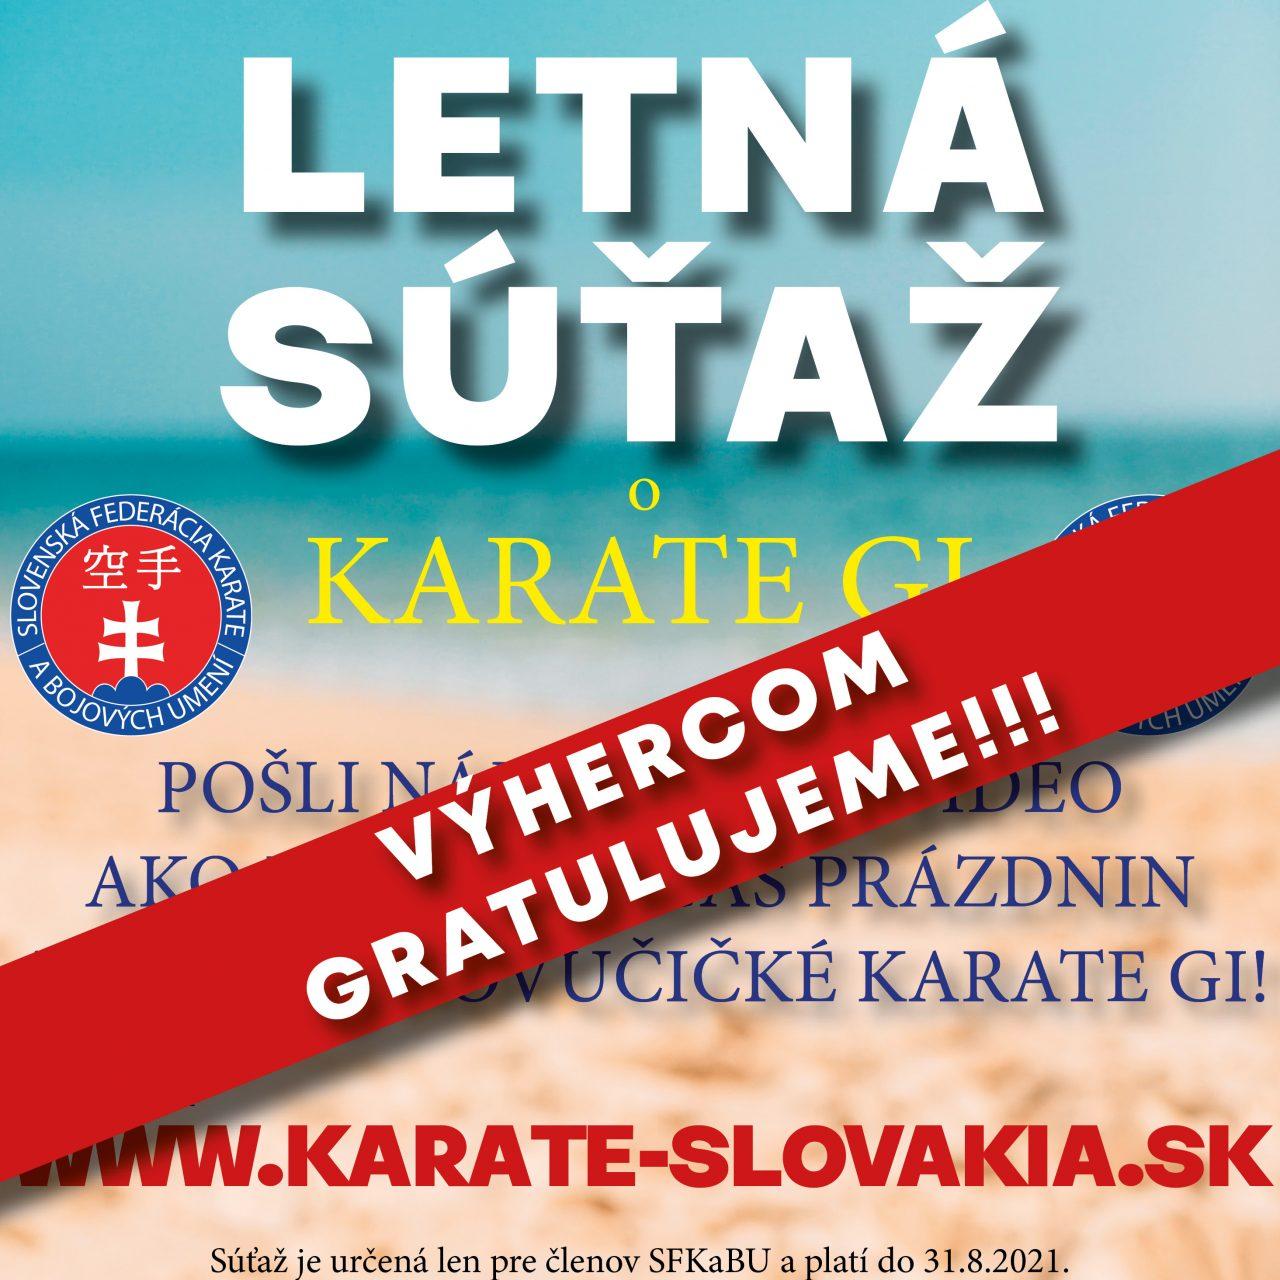 https://karate-slovakia.sk/wp-content/uploads/letna-sutaz-FB-1-1280x1280.jpg